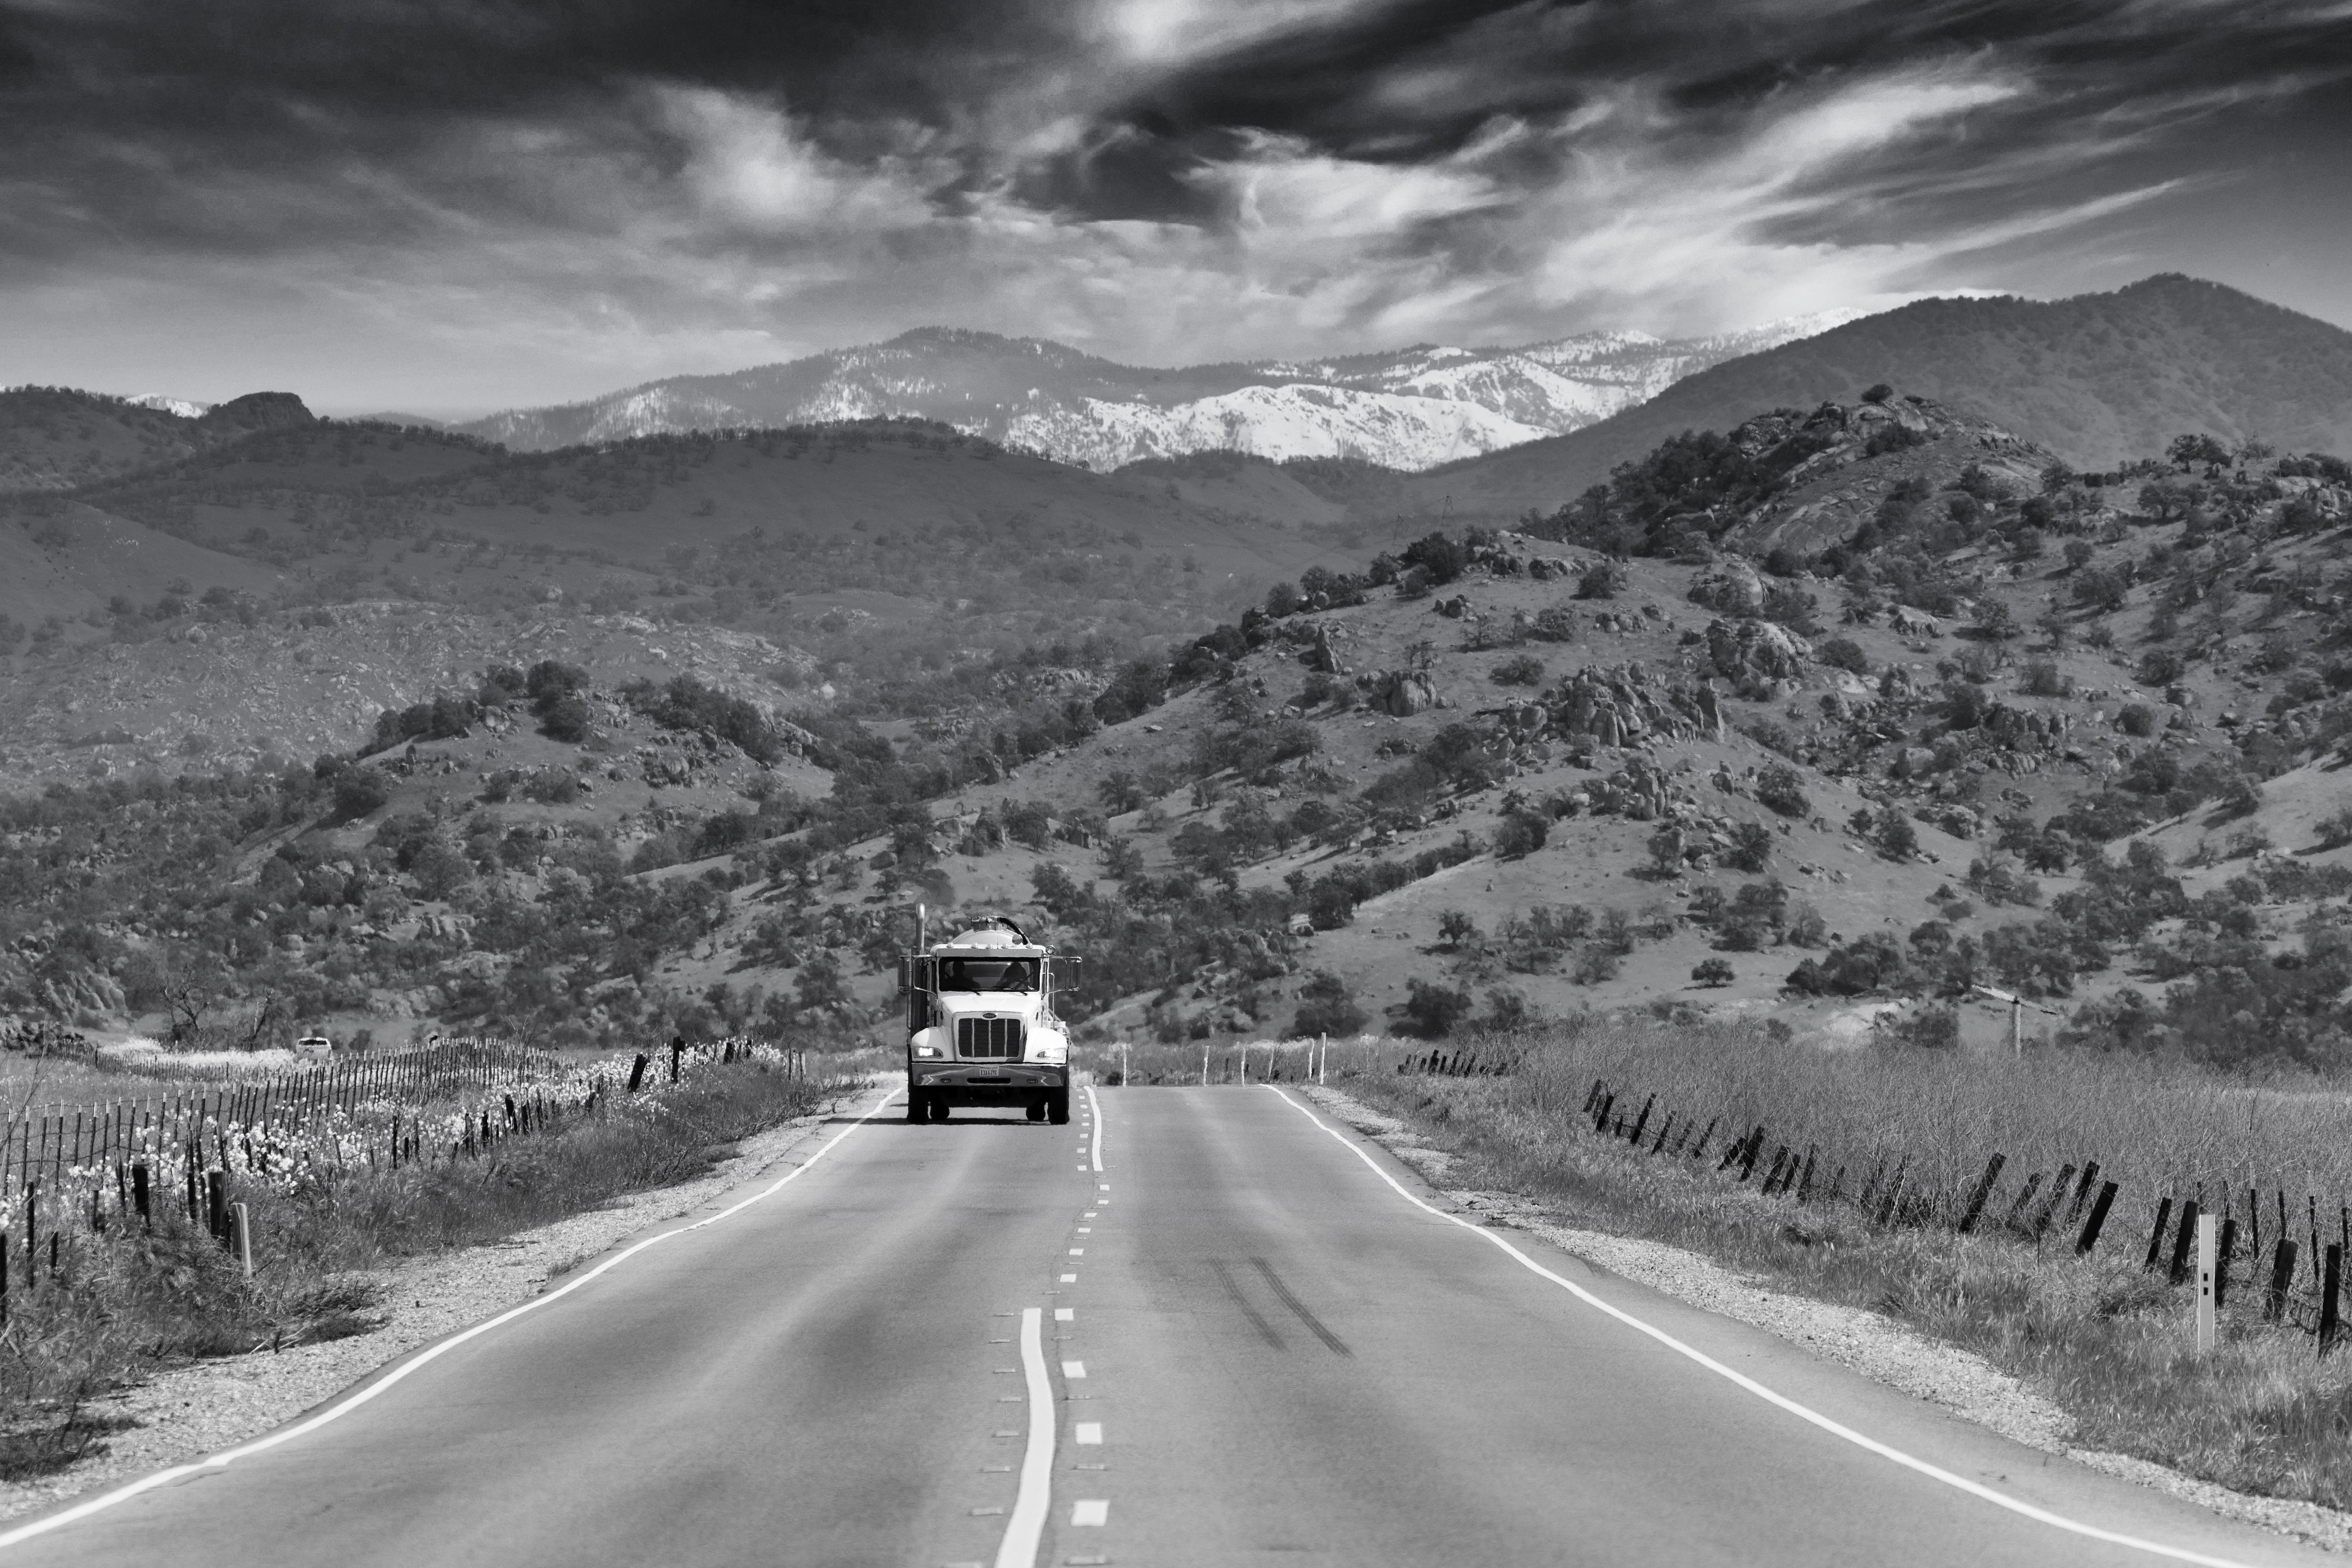 California State Route 140, towards Yosemite National Park